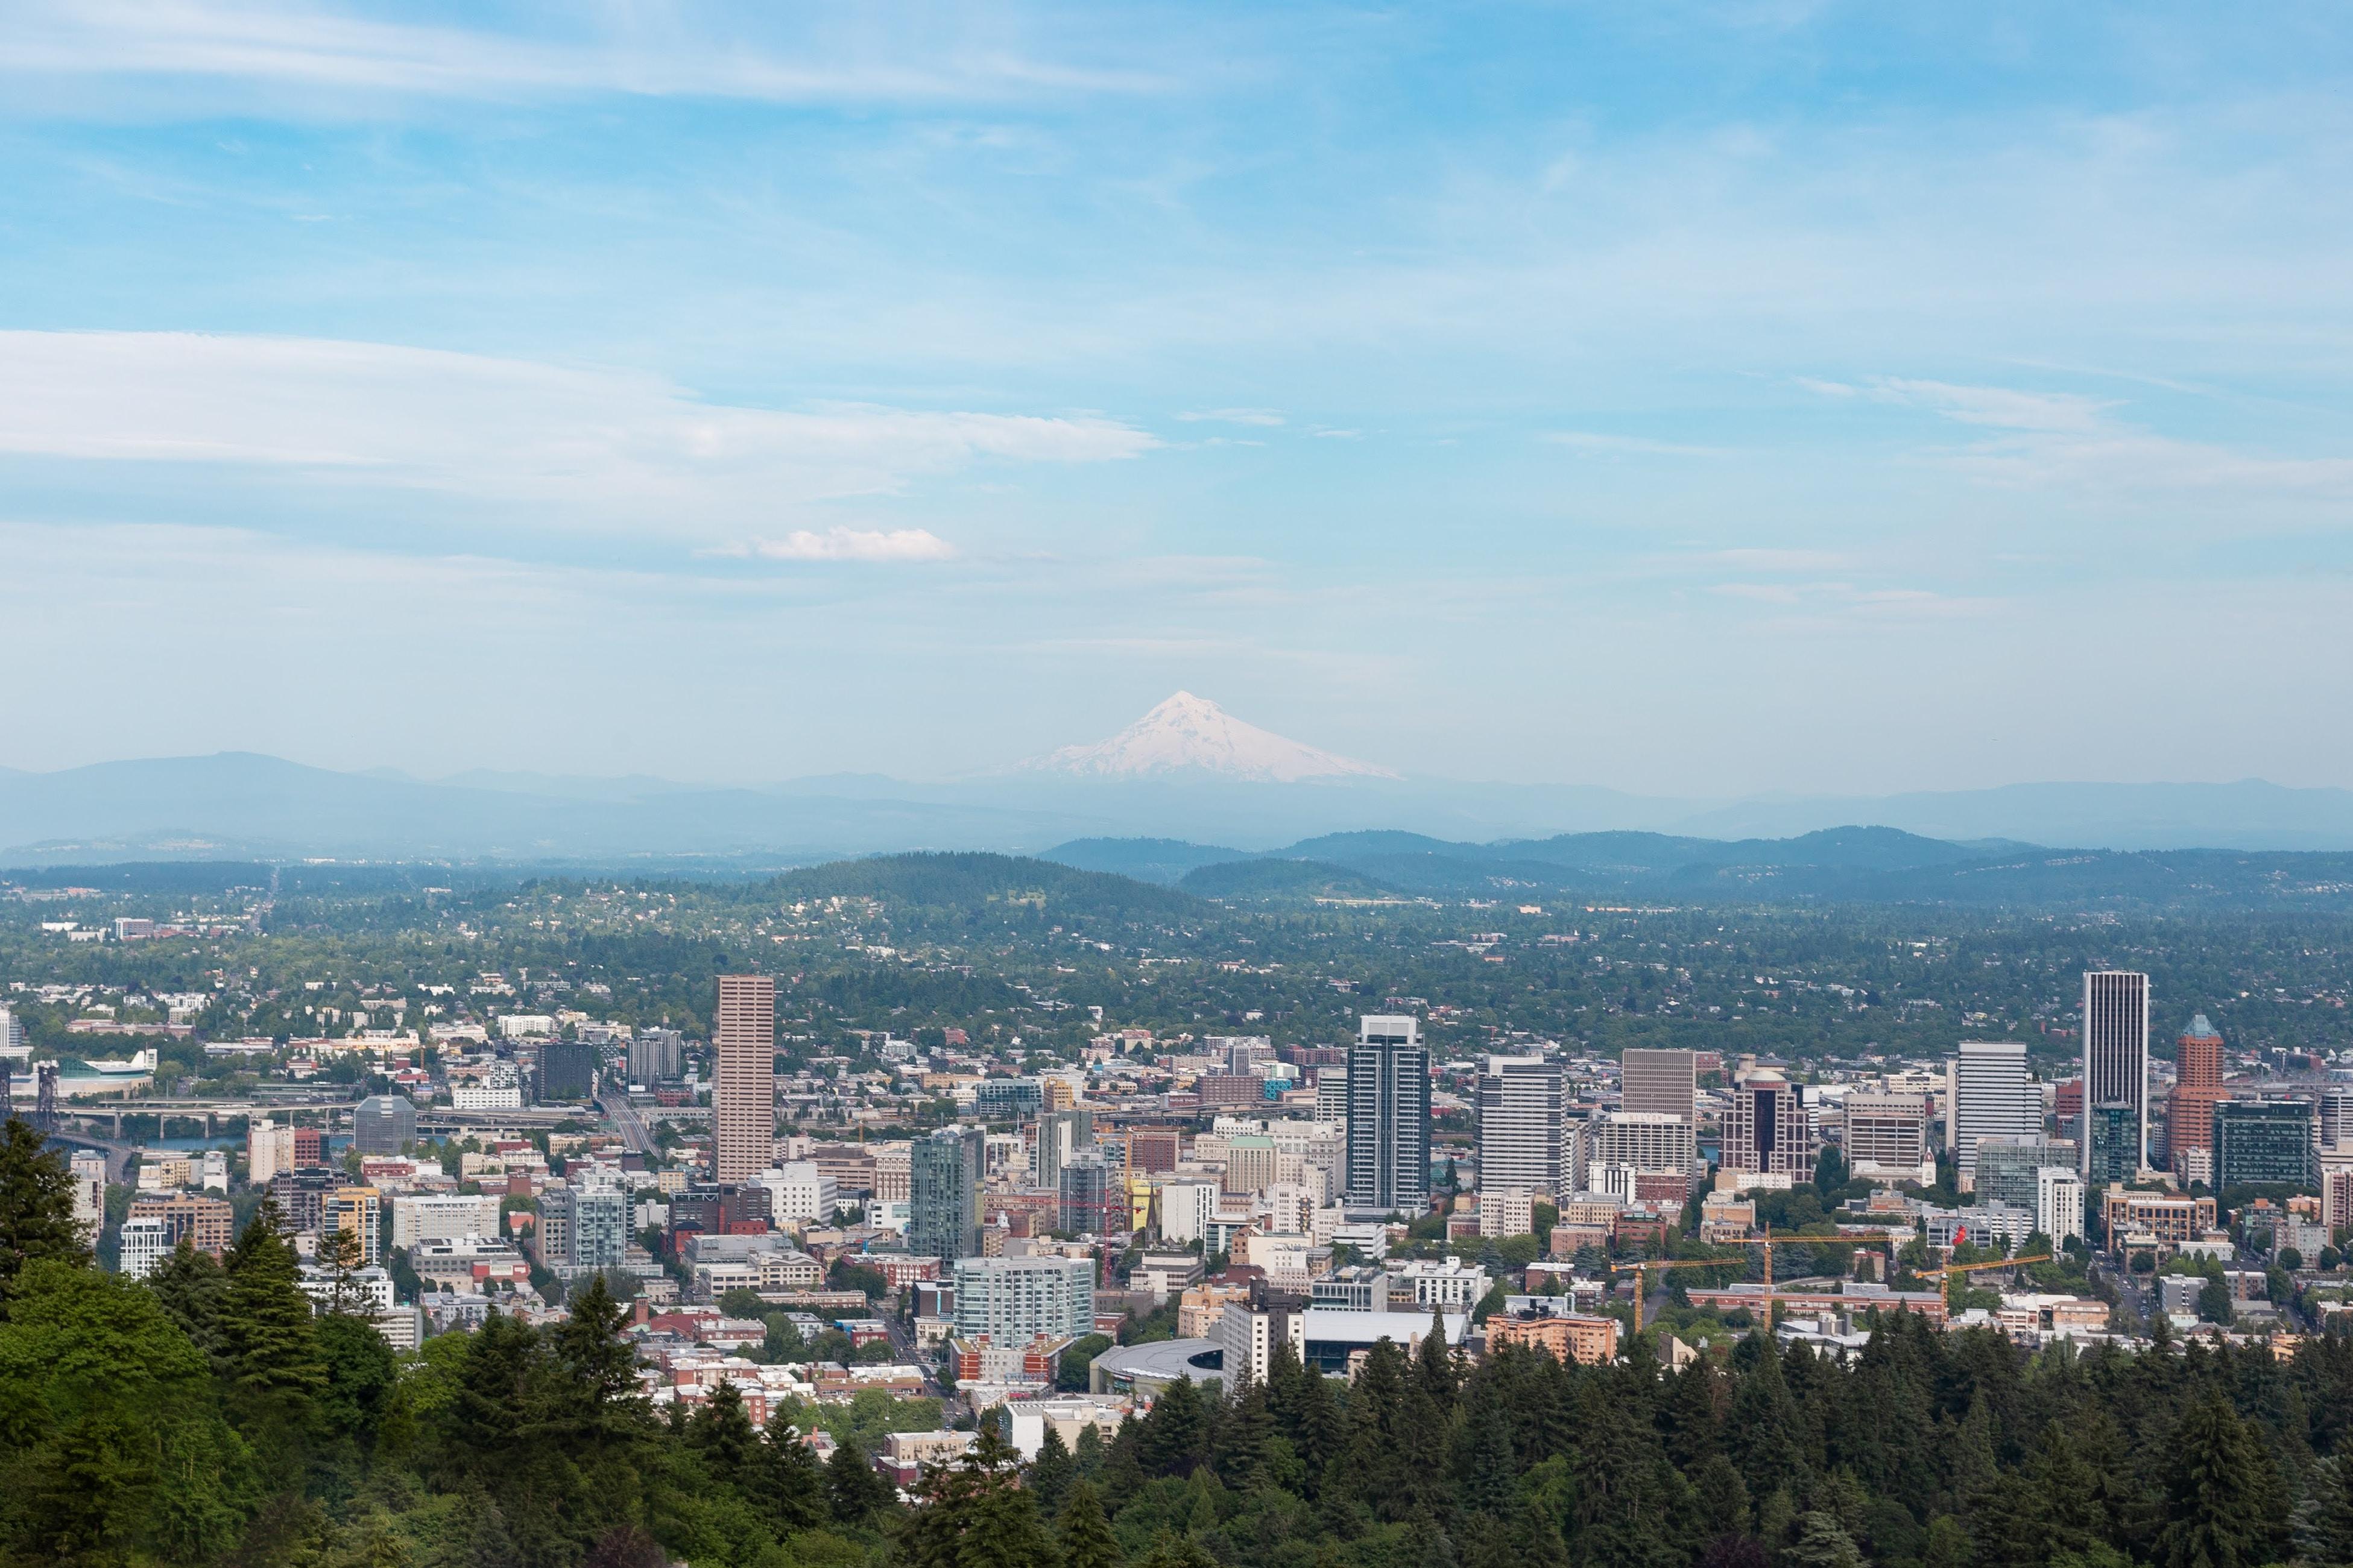 Top 70+ Tech Companies In Portland In 2021